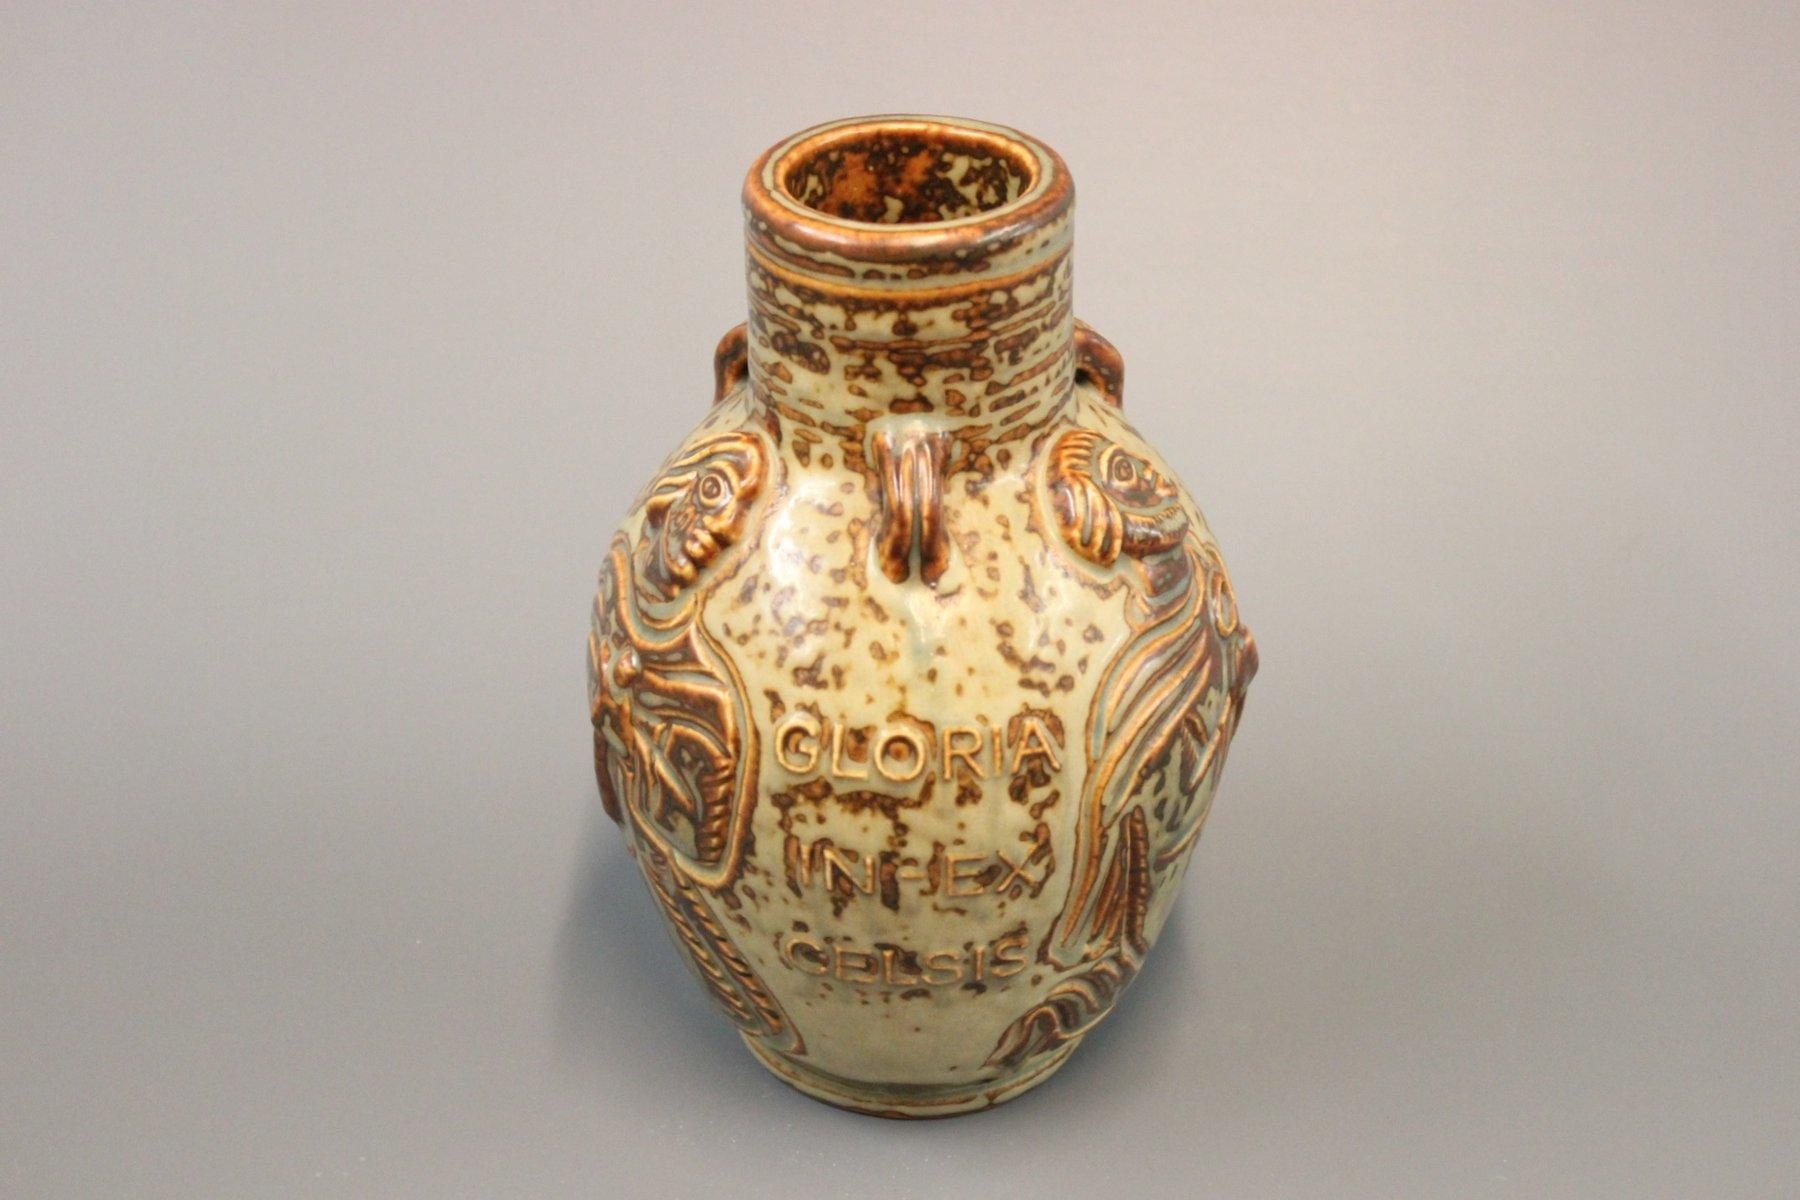 Stoneware vase by jais nielsen for royal copenhagen 1958 for sale stoneware vase by jais nielsen for royal copenhagen 1958 reviewsmspy